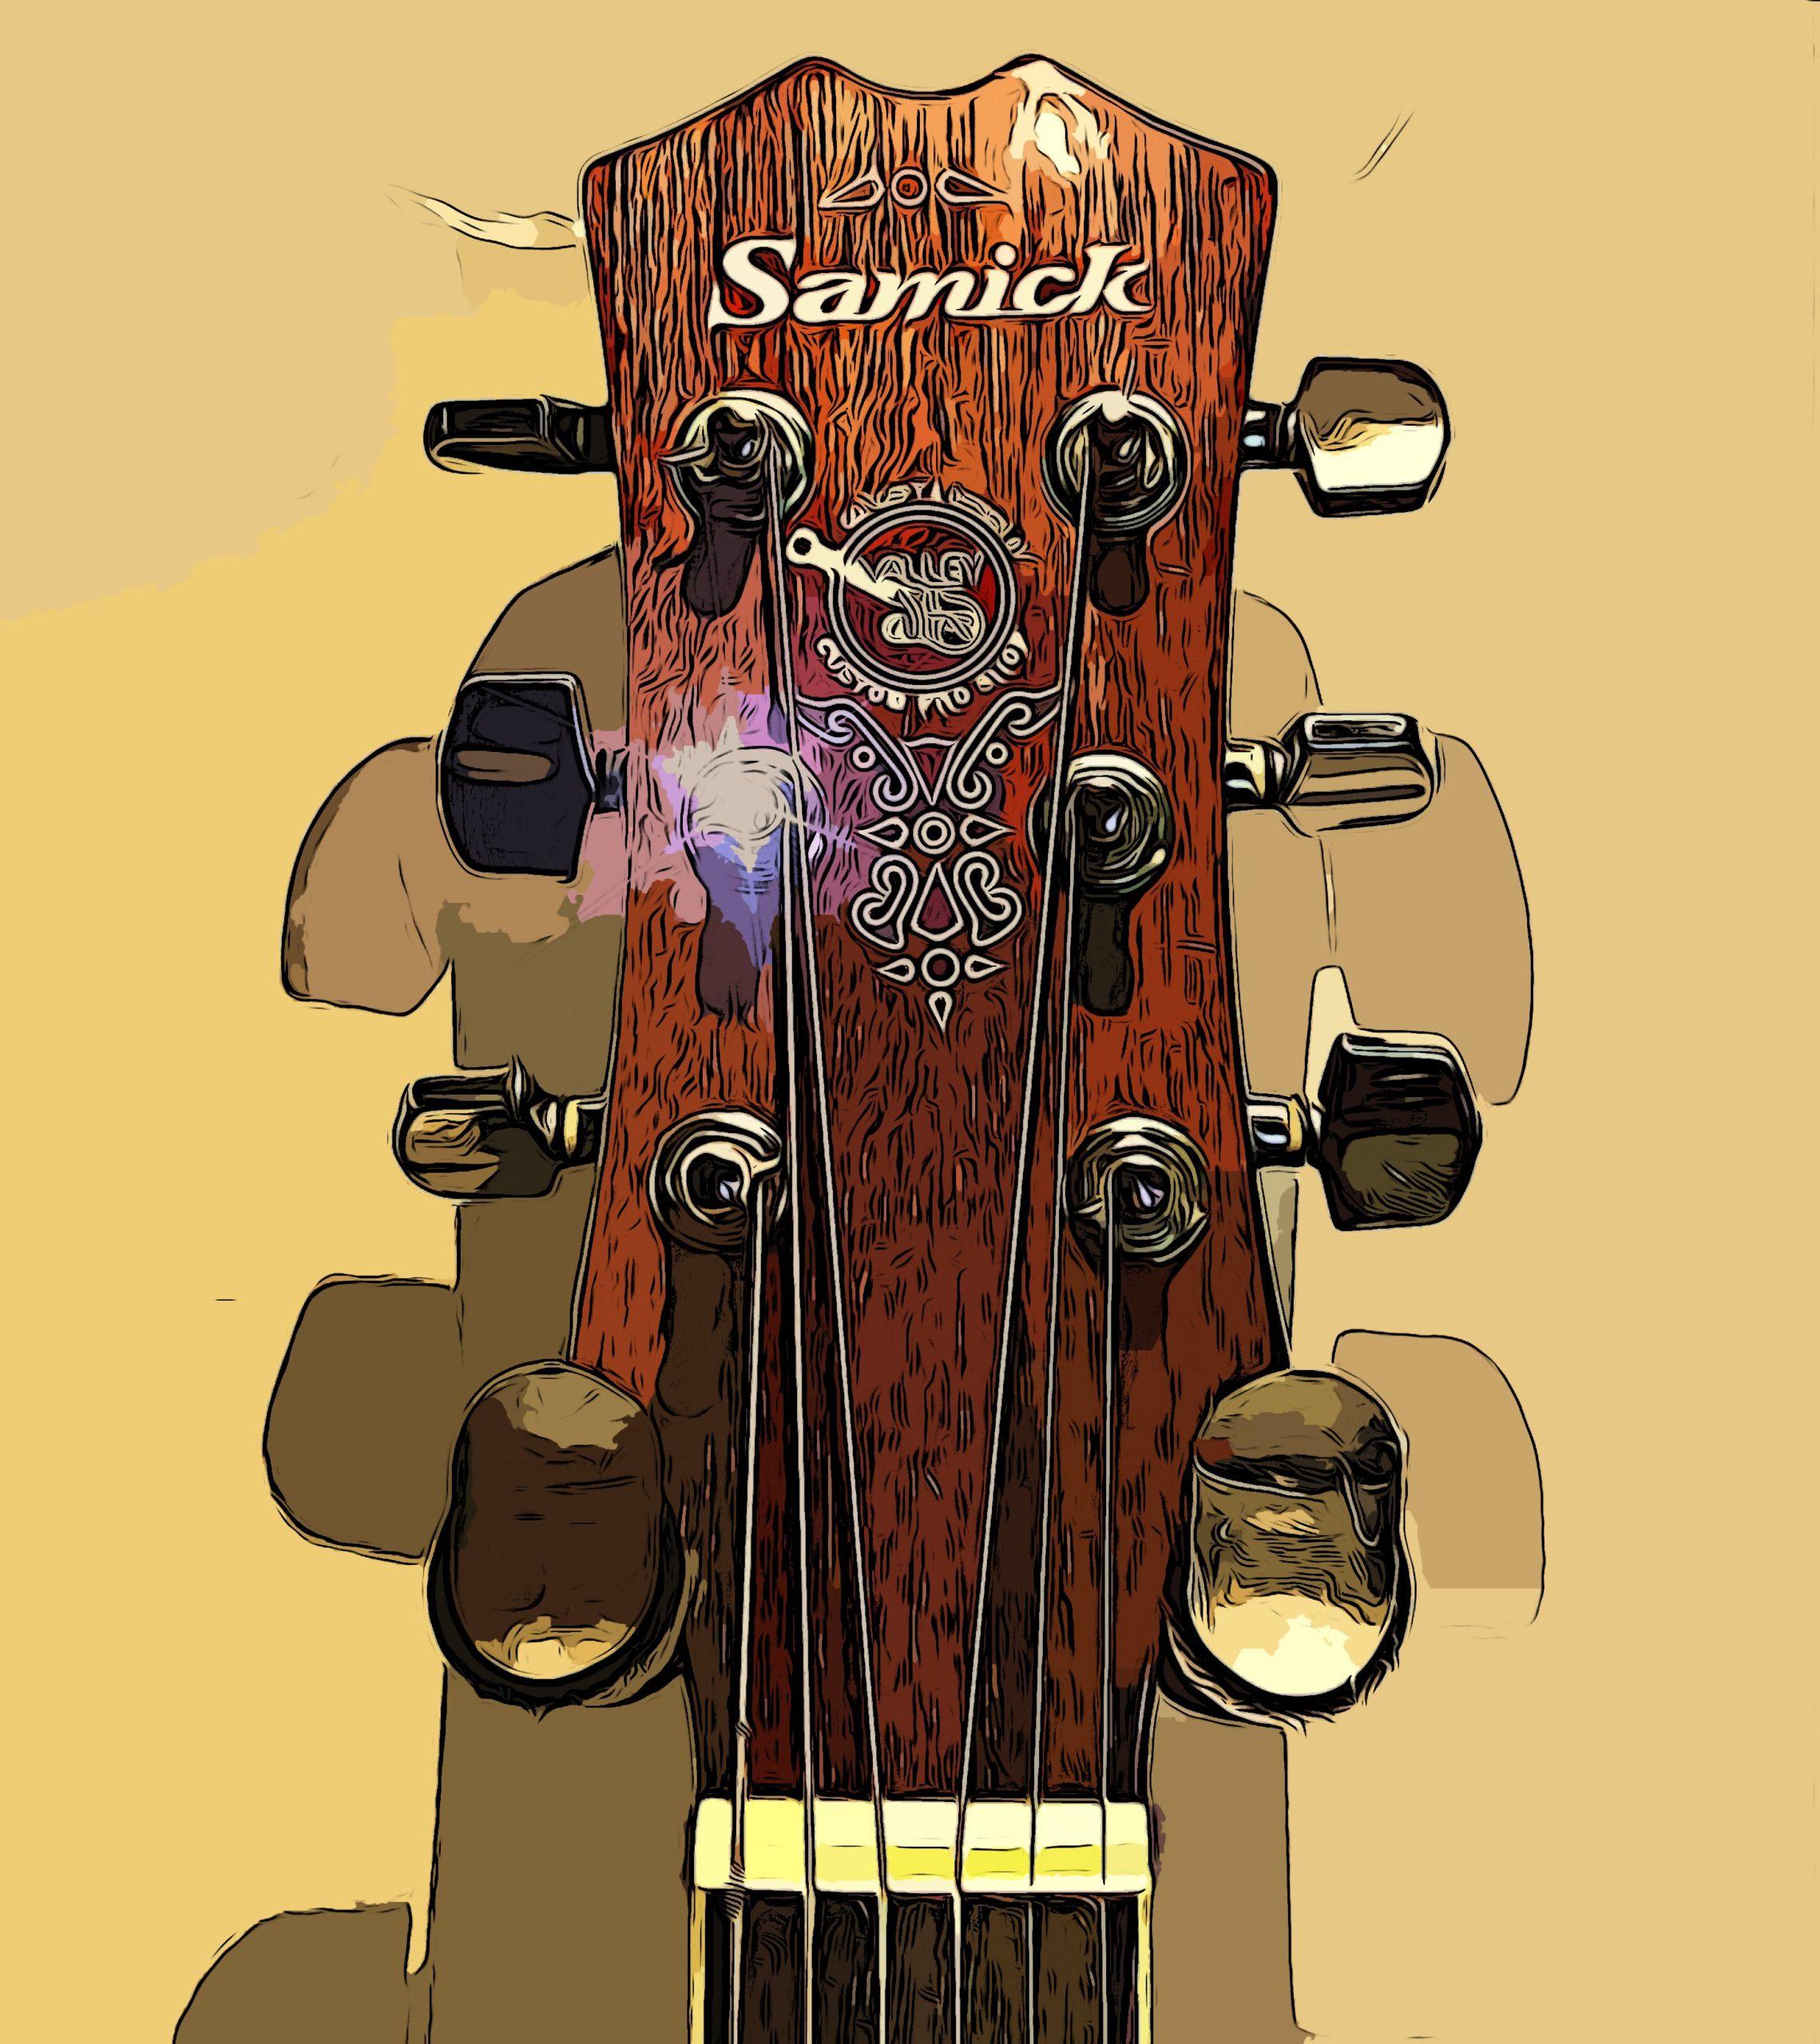 Samick cartooned headstock